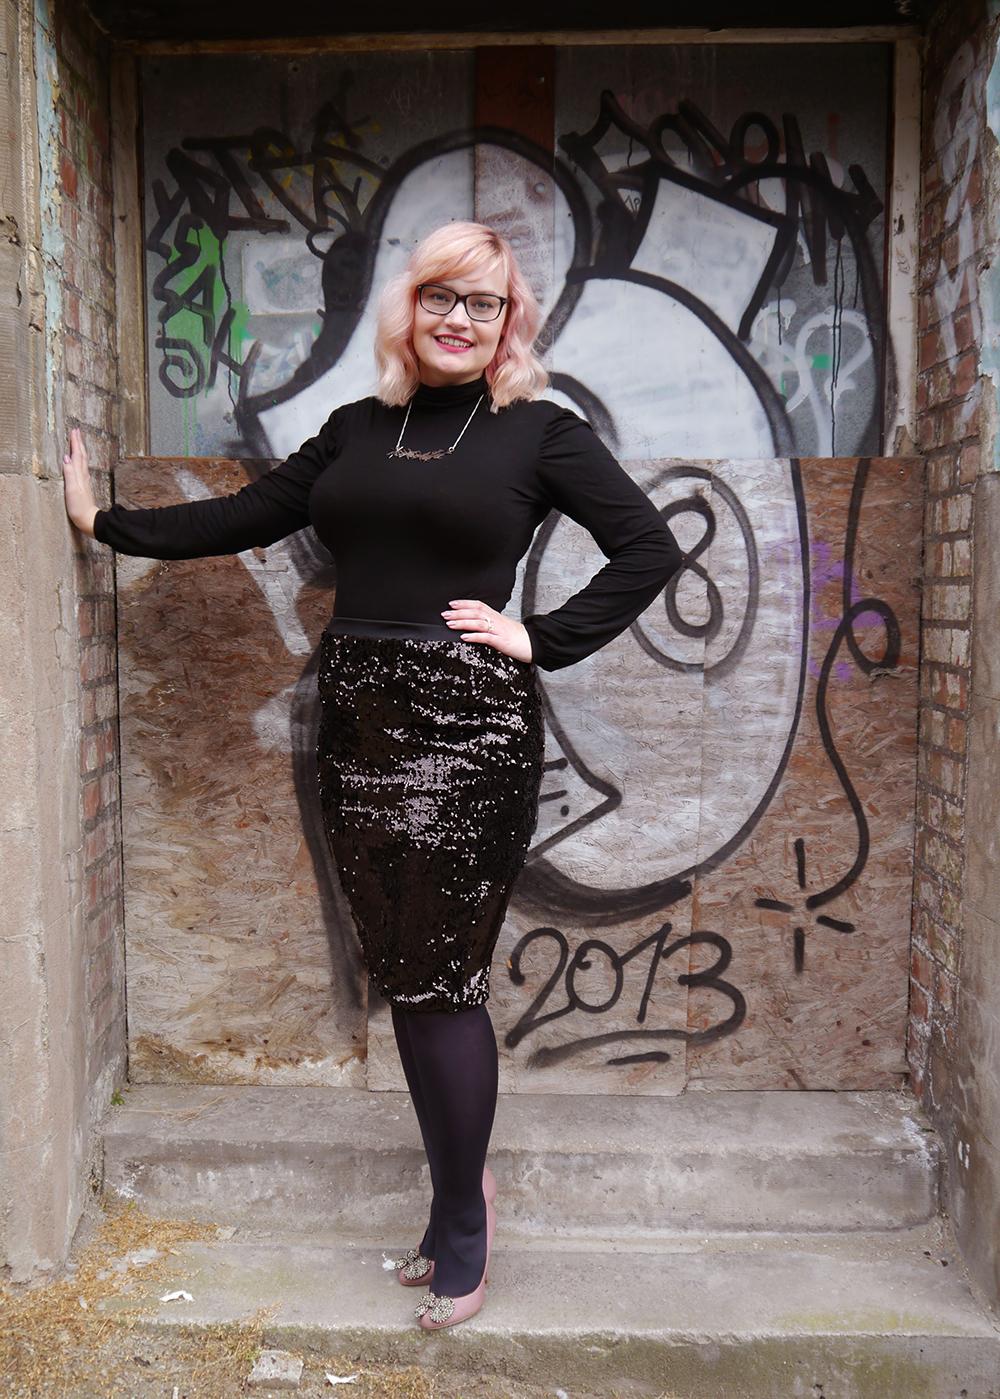 lady muck, laser cut jewellery, grafitti, Dundee photoshoot, peach hair DIY, blakc sequin skirt, Kurt Geiger shoes, hourglass shape, plus size blogger, Scottish fashion blogger,polo neck, Scottish winter look,